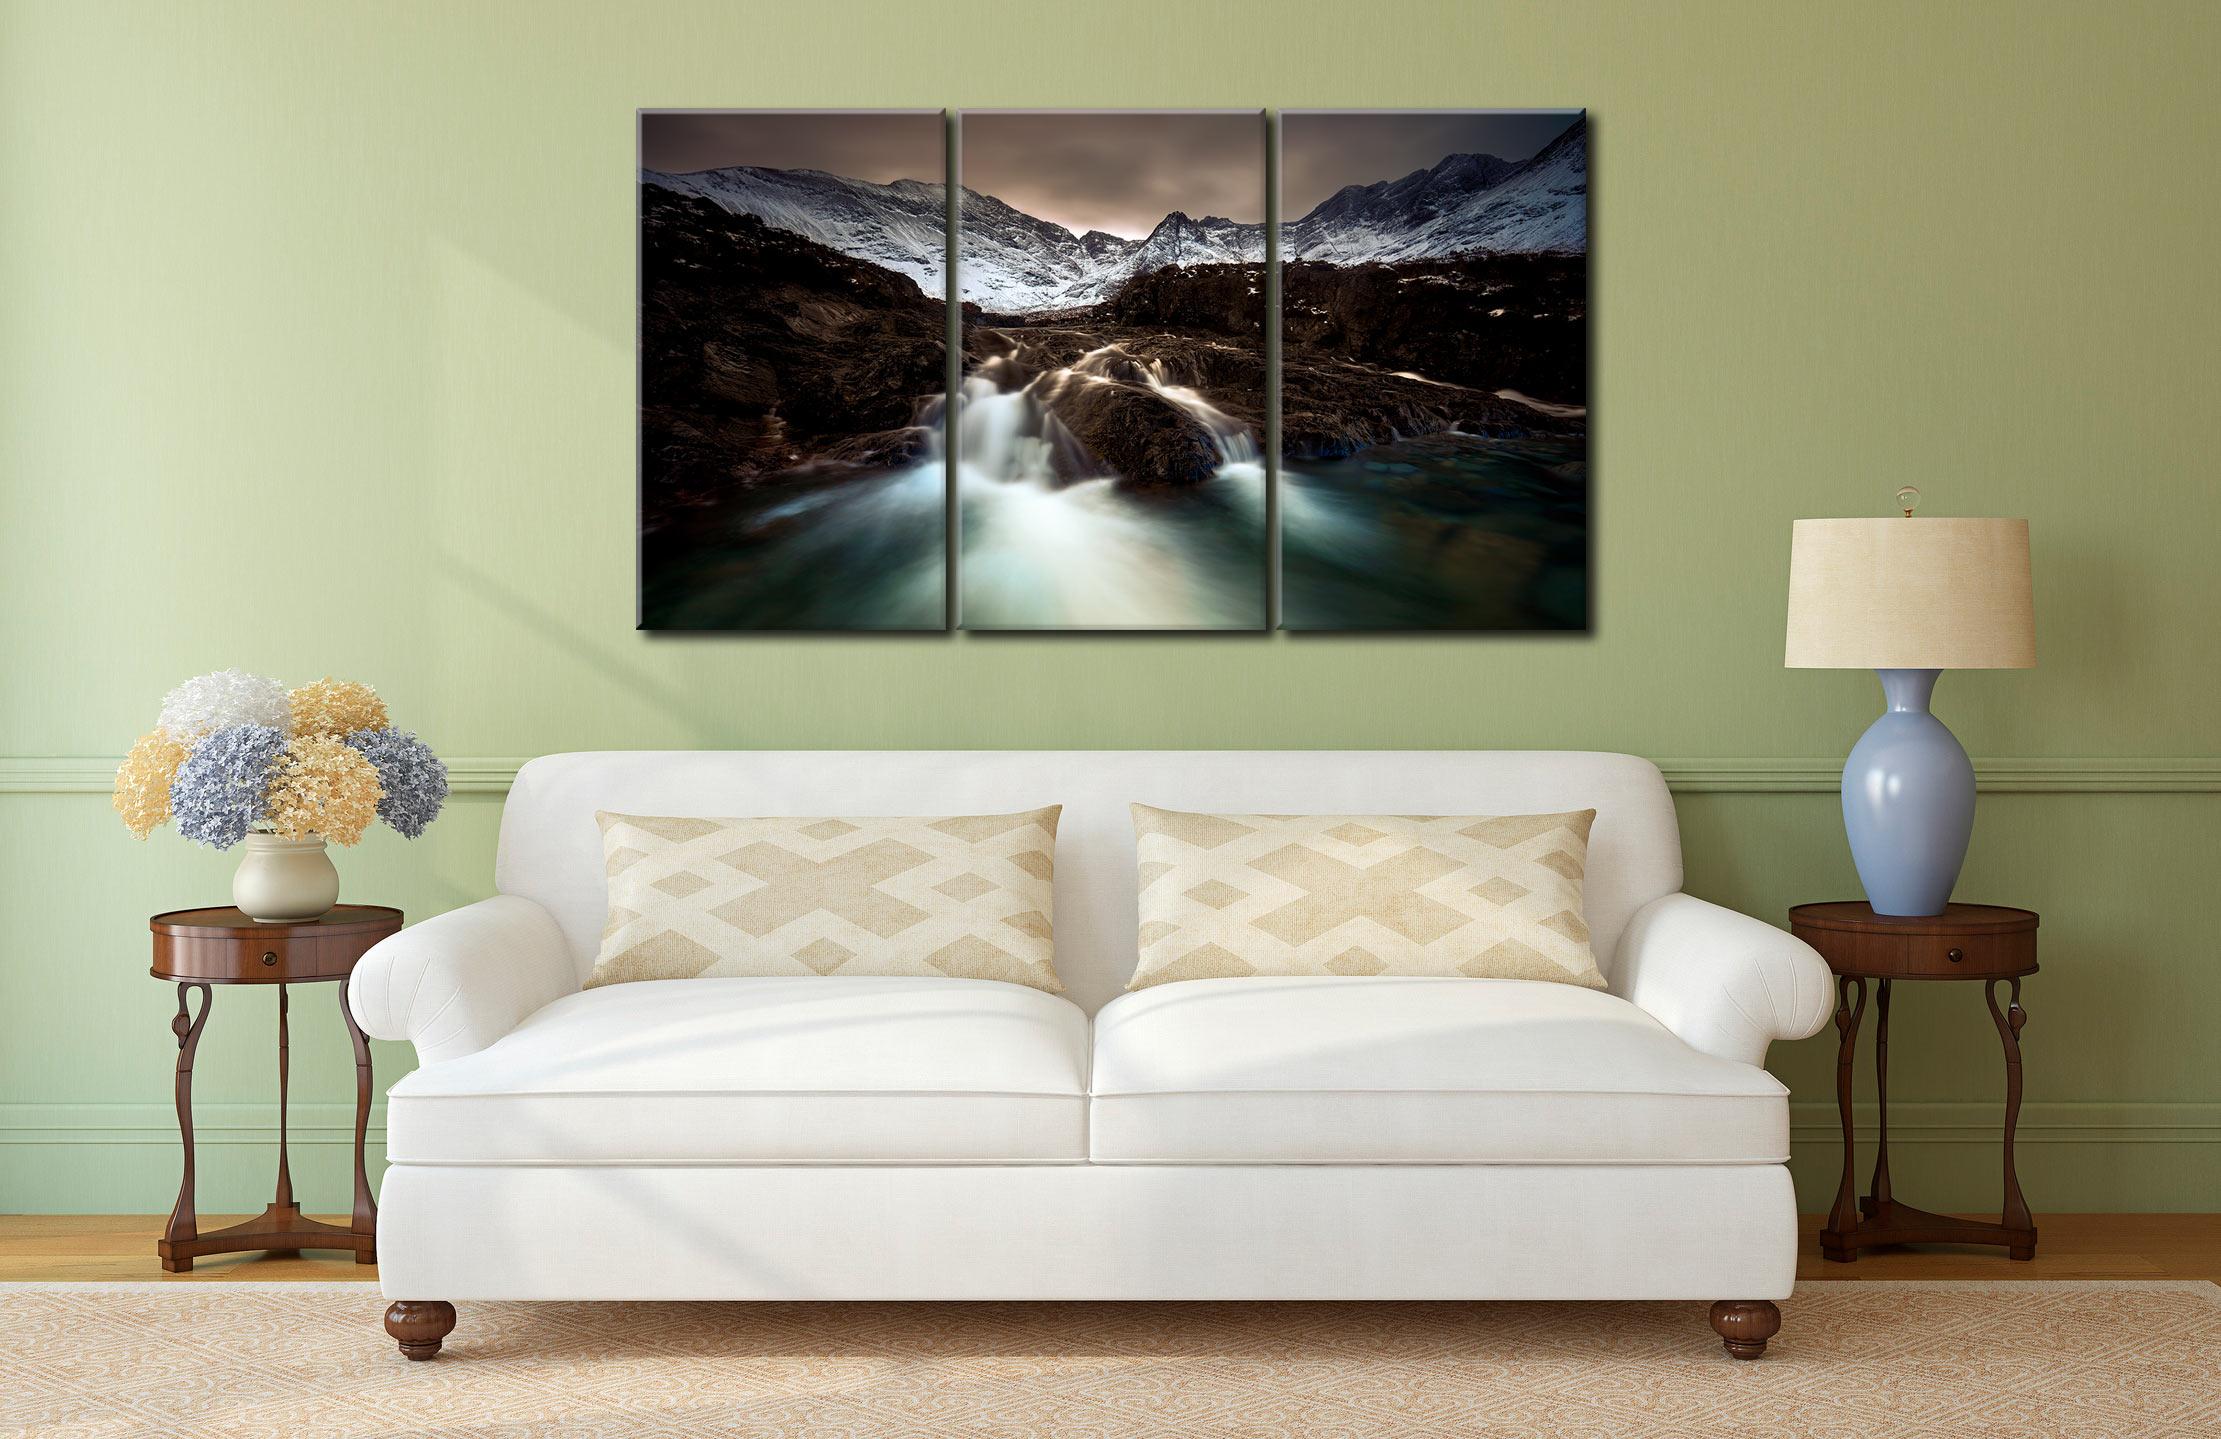 The Dark Fairy Pools - 3 Panel Canvas on Wall